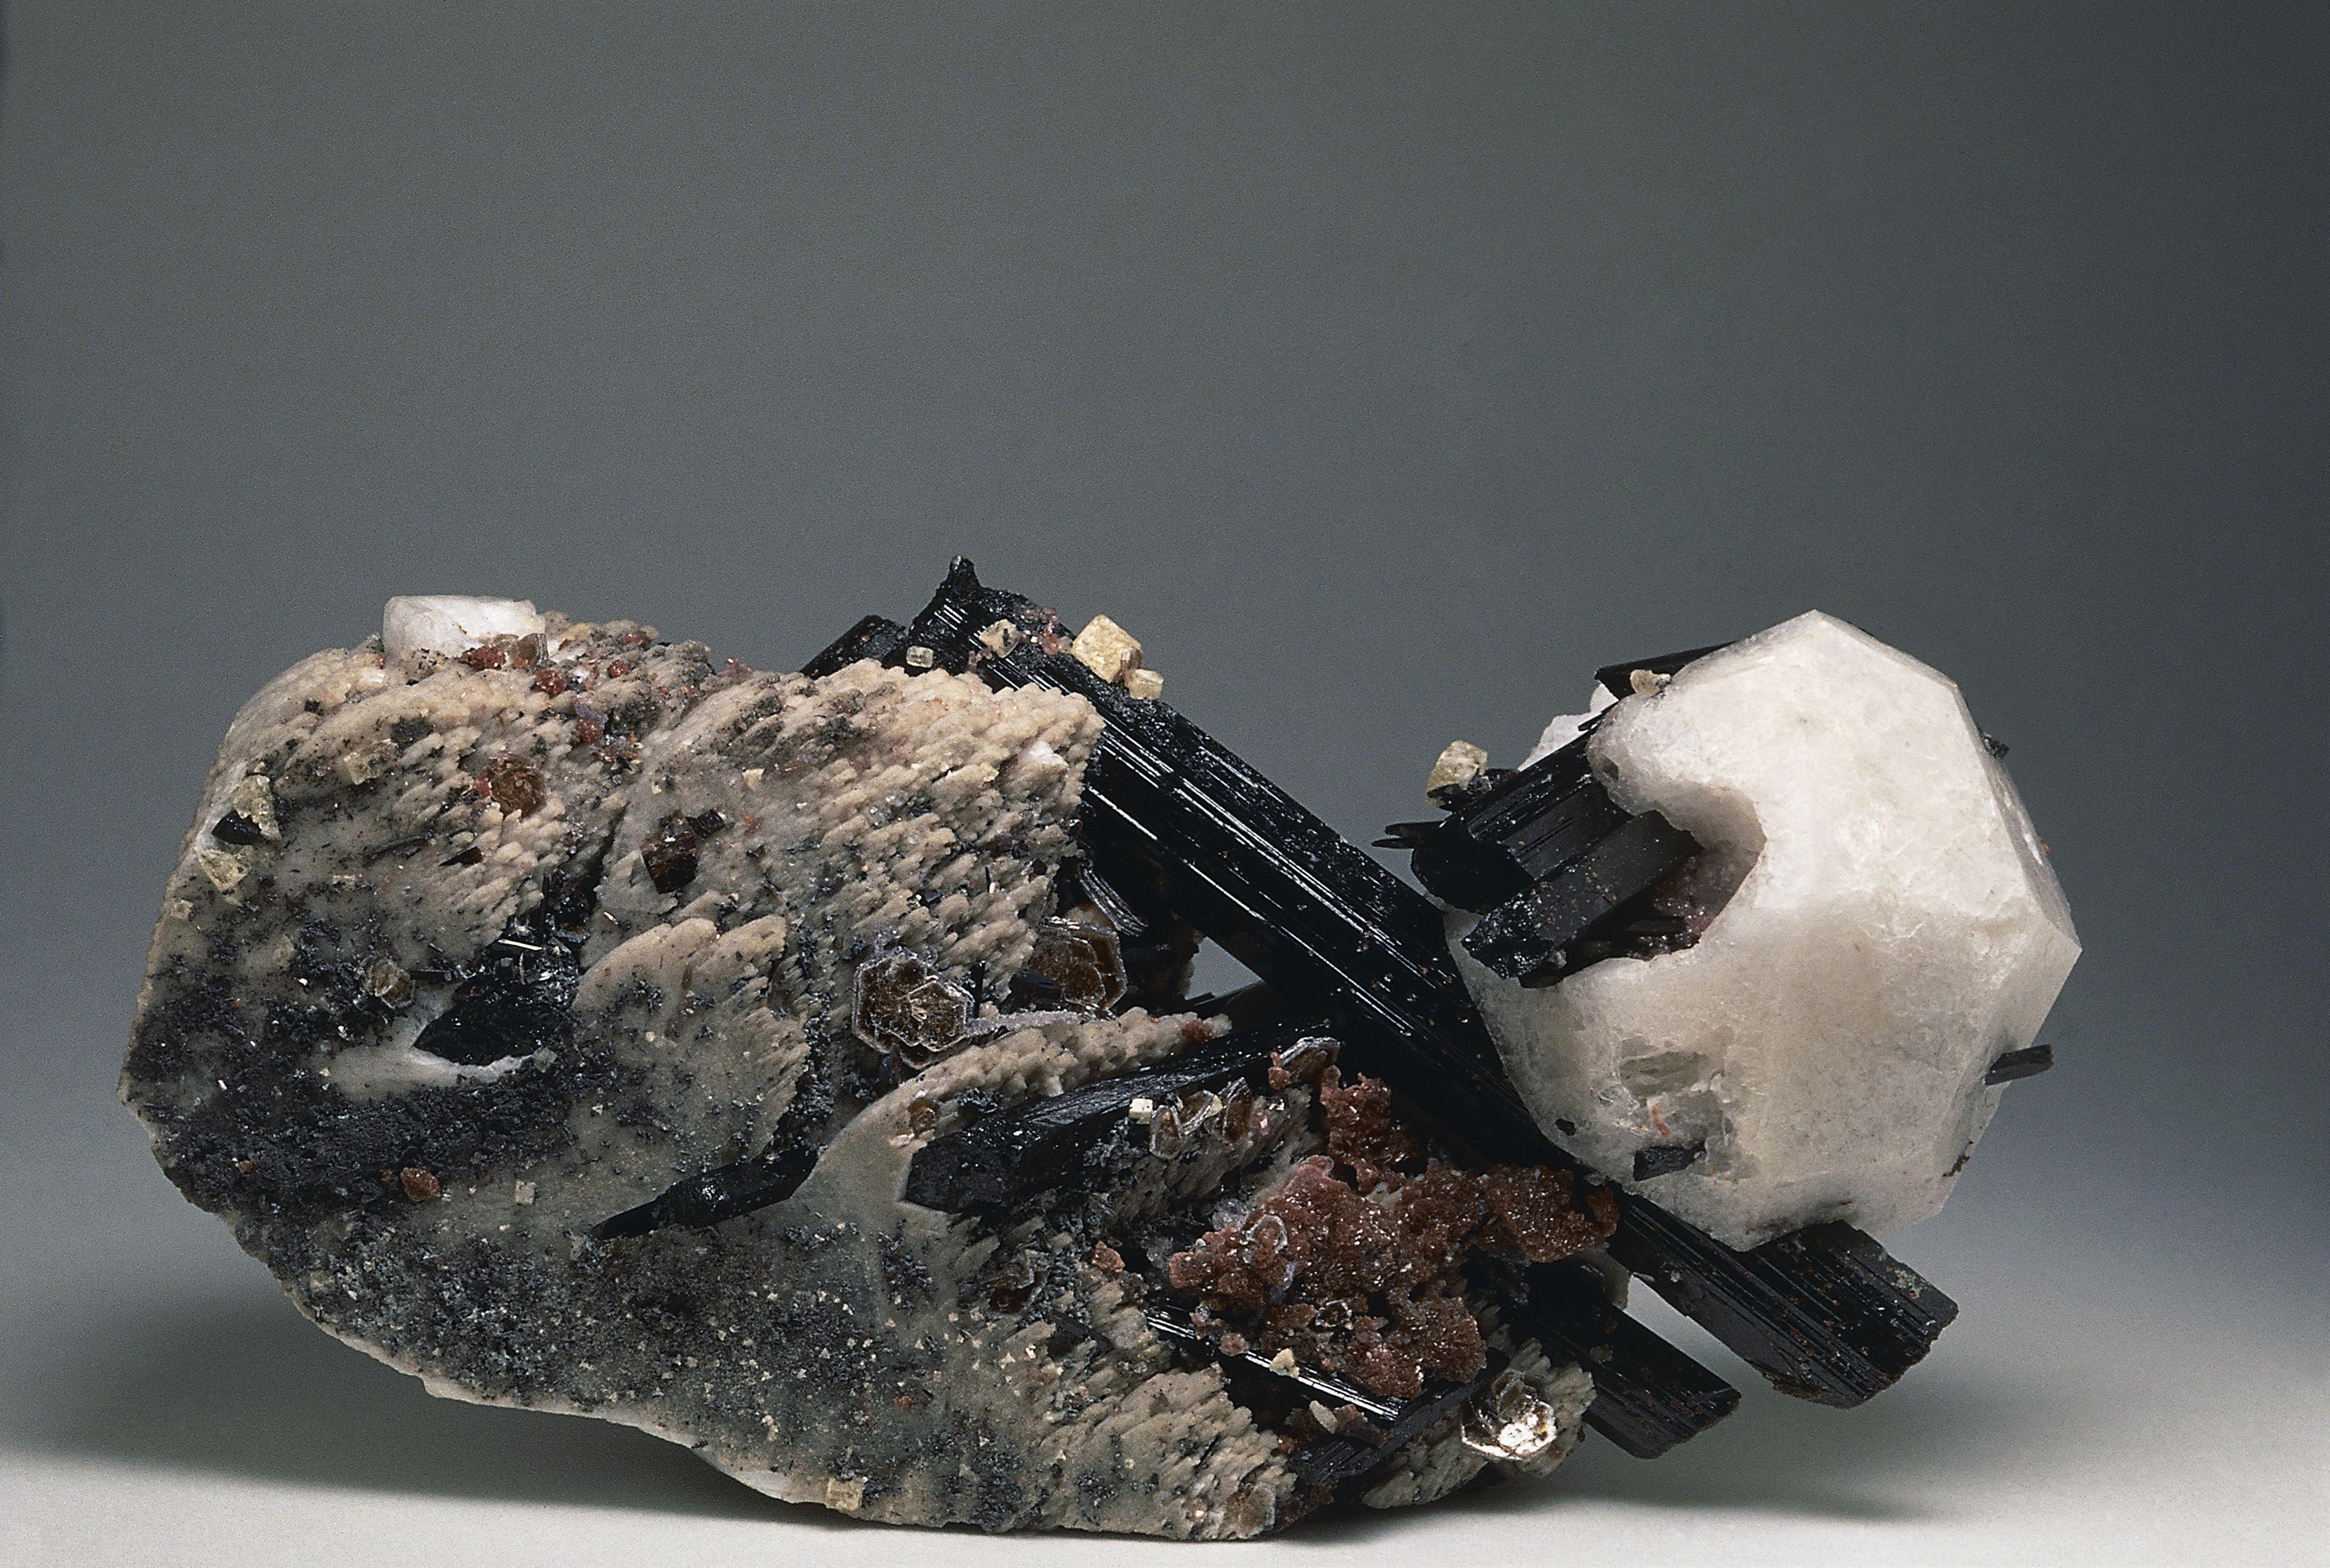 Close-up of an Aegirine rock